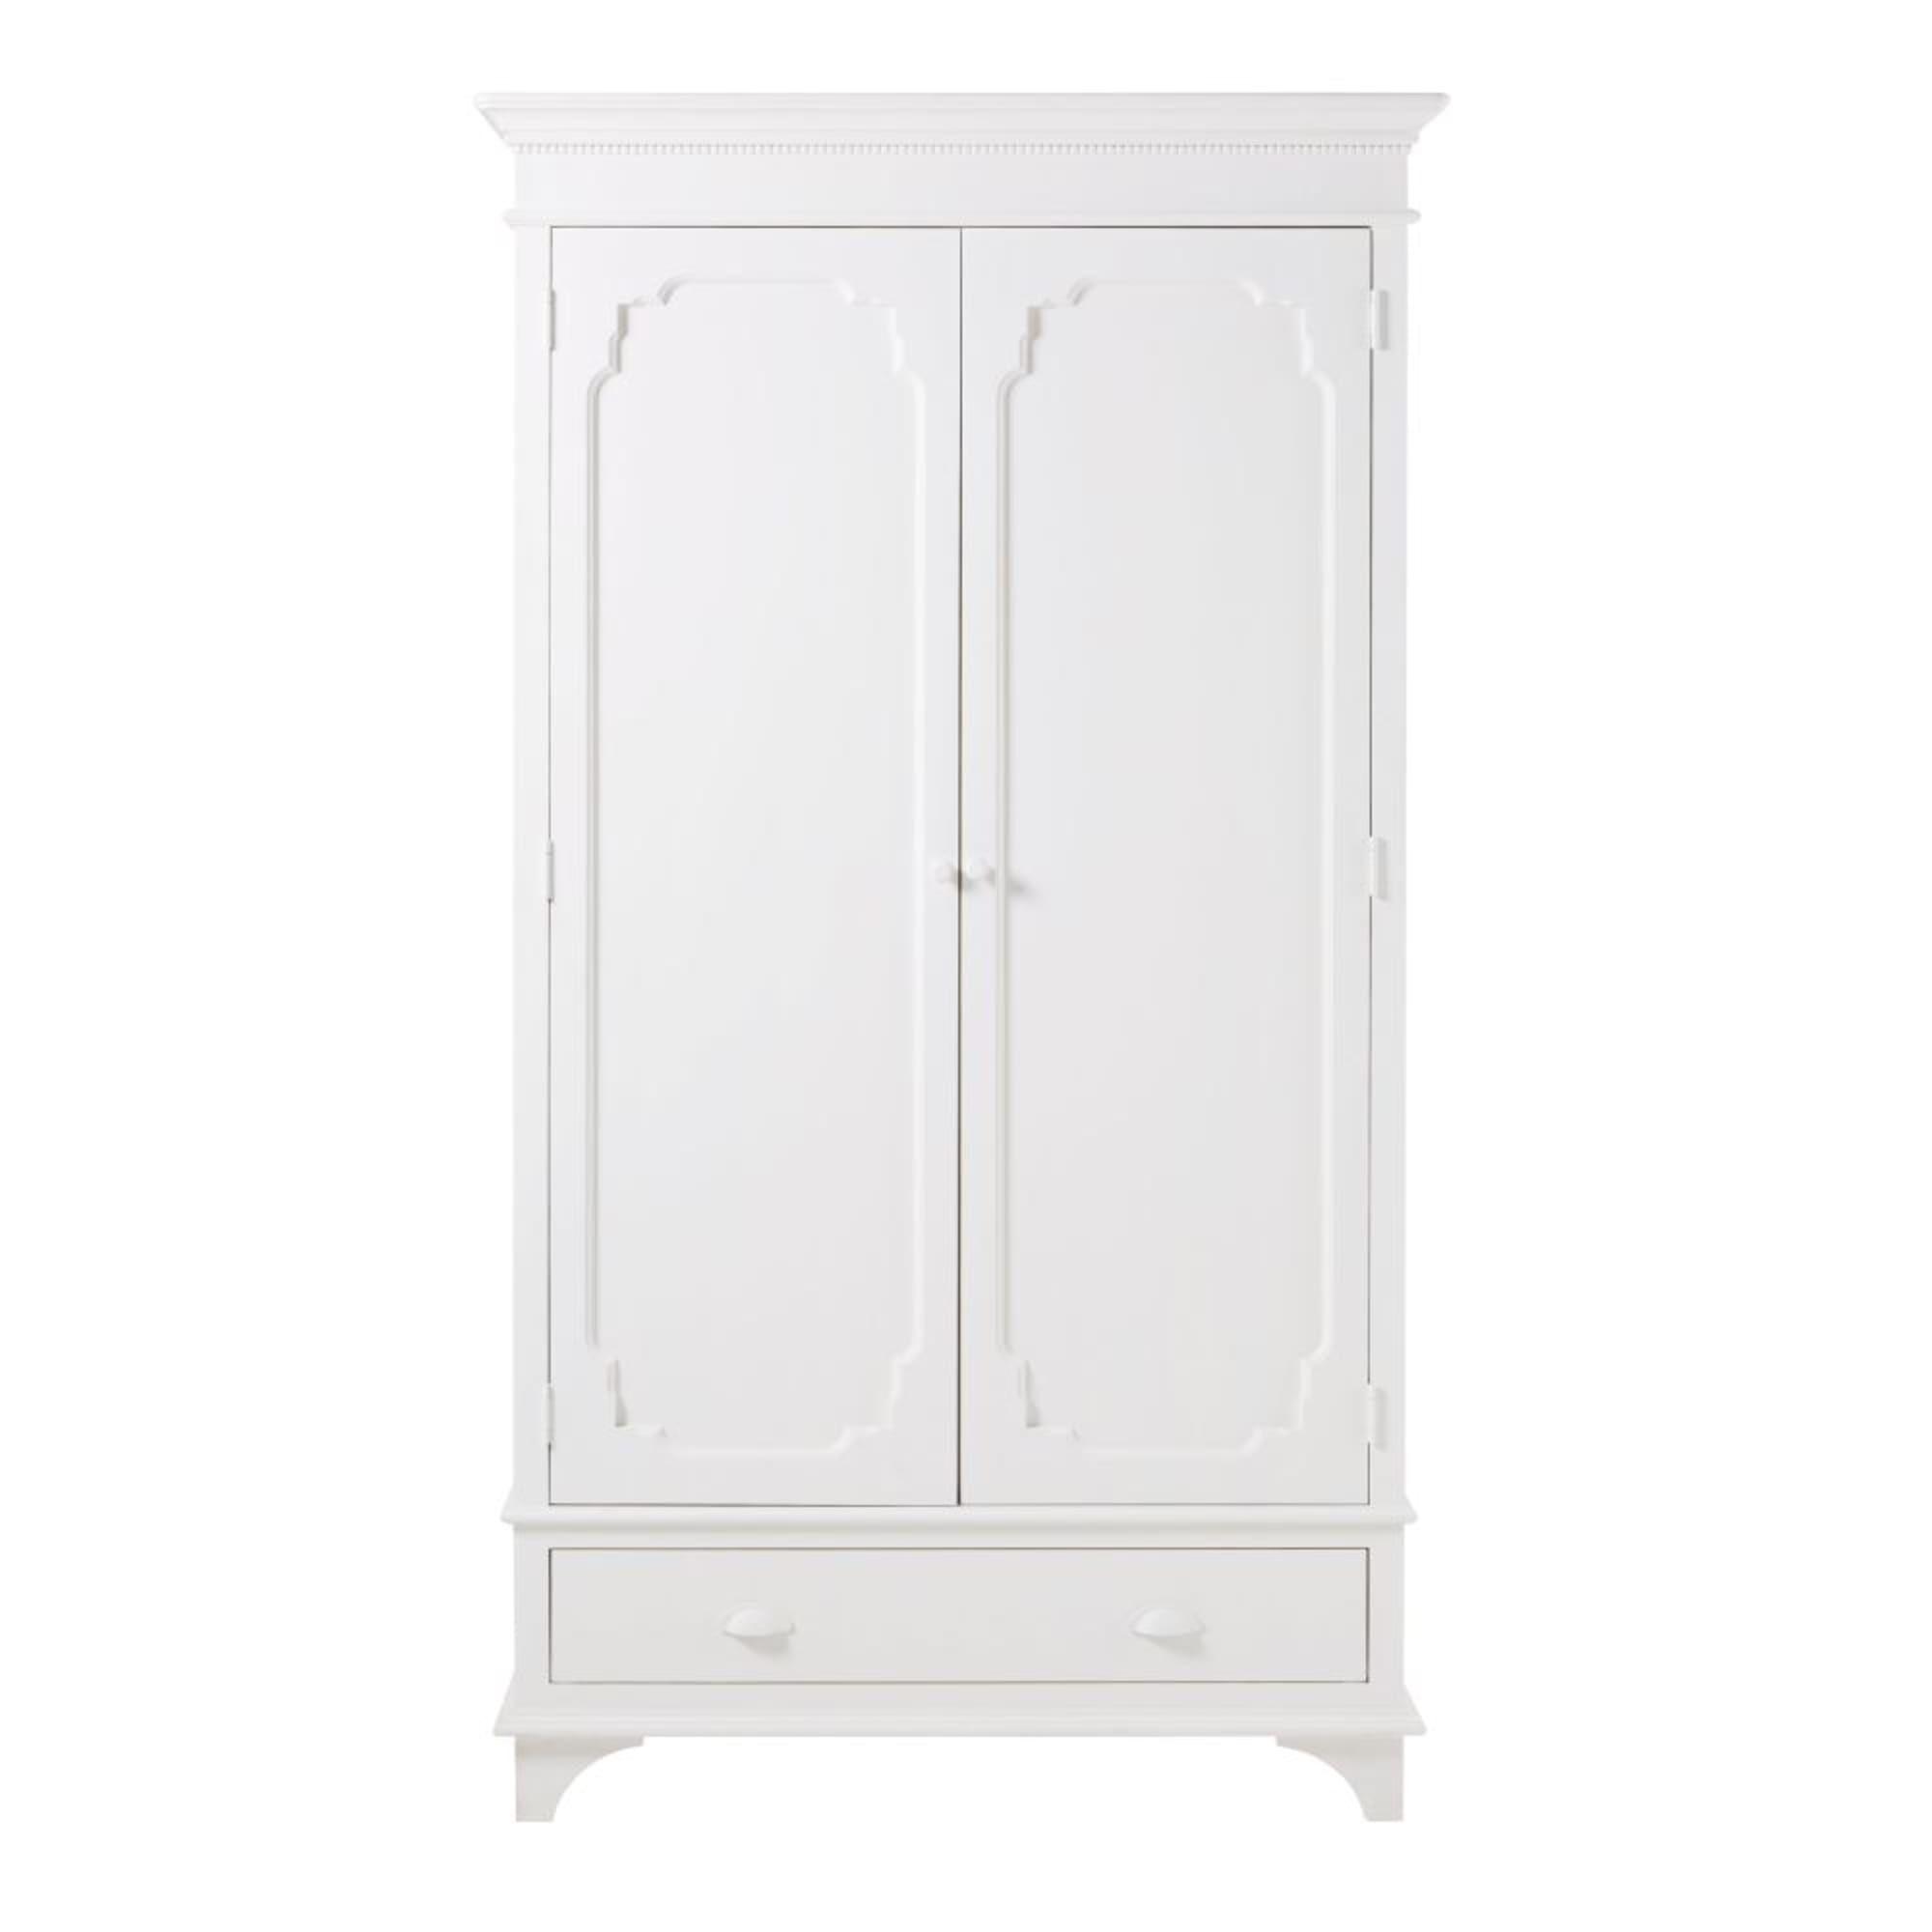 Guardarropa Blanco Roto Con 2 Puertas Idylle Maisons Du Monde 2 Door Wardrobe Kids Furniture Design White Cupboards